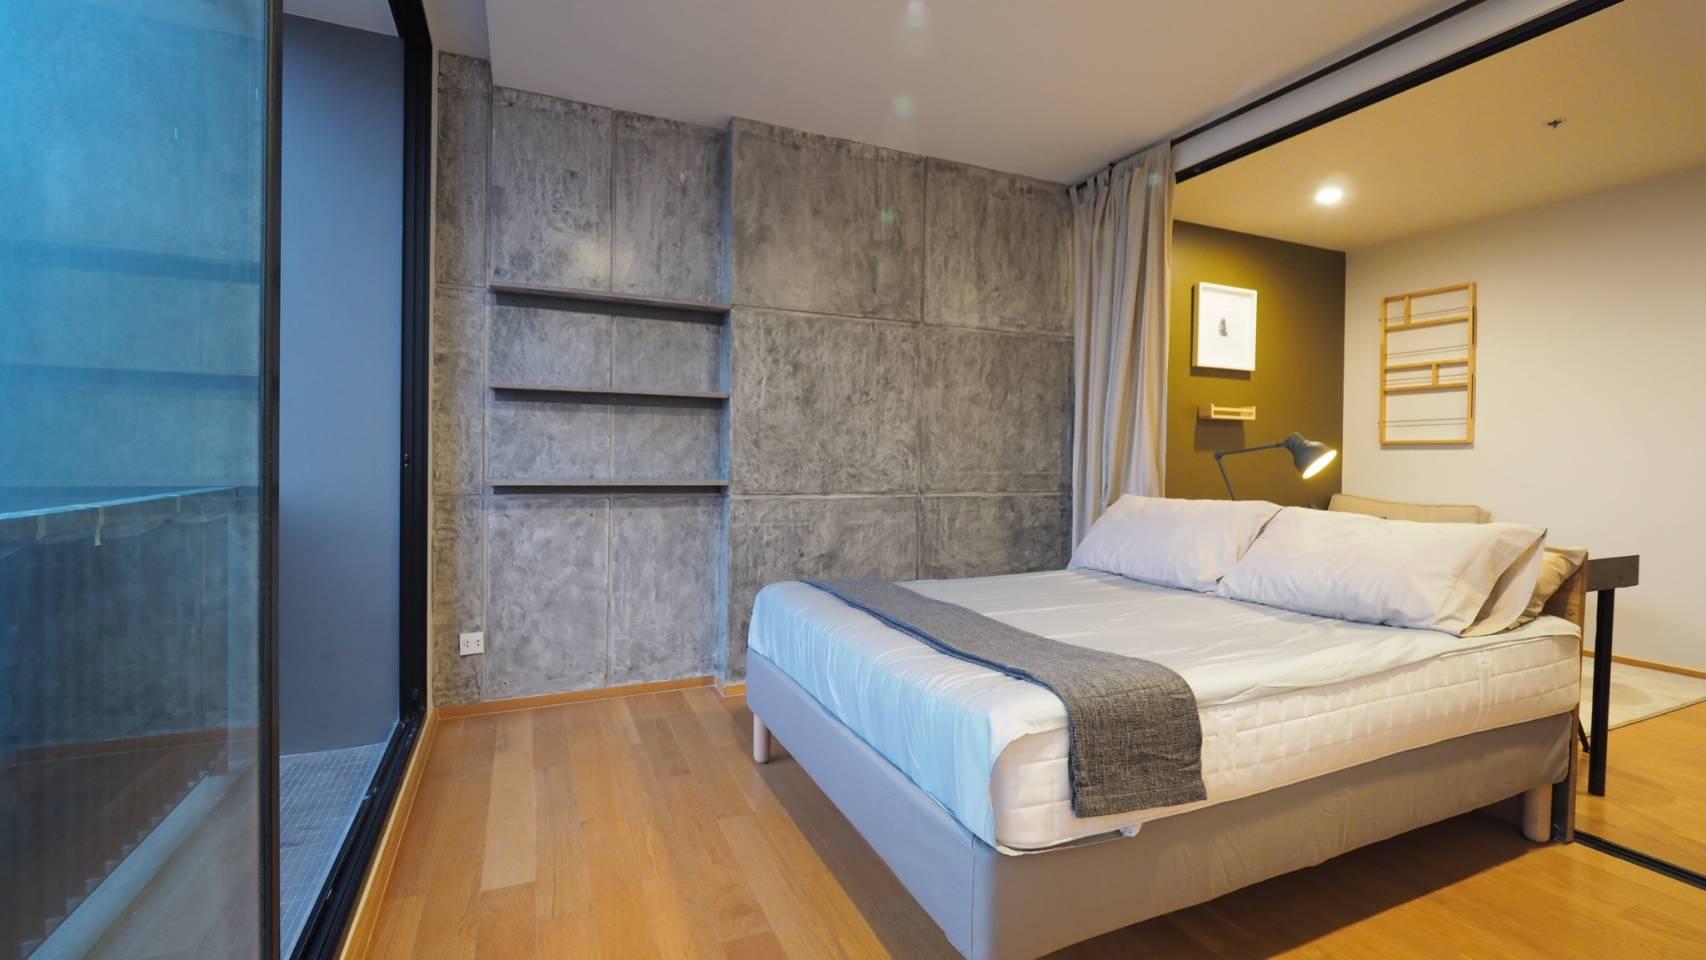 NOBLE REVO SILOM for Rent – BTS Surasak 160 meters – Unit 33 Sq.m